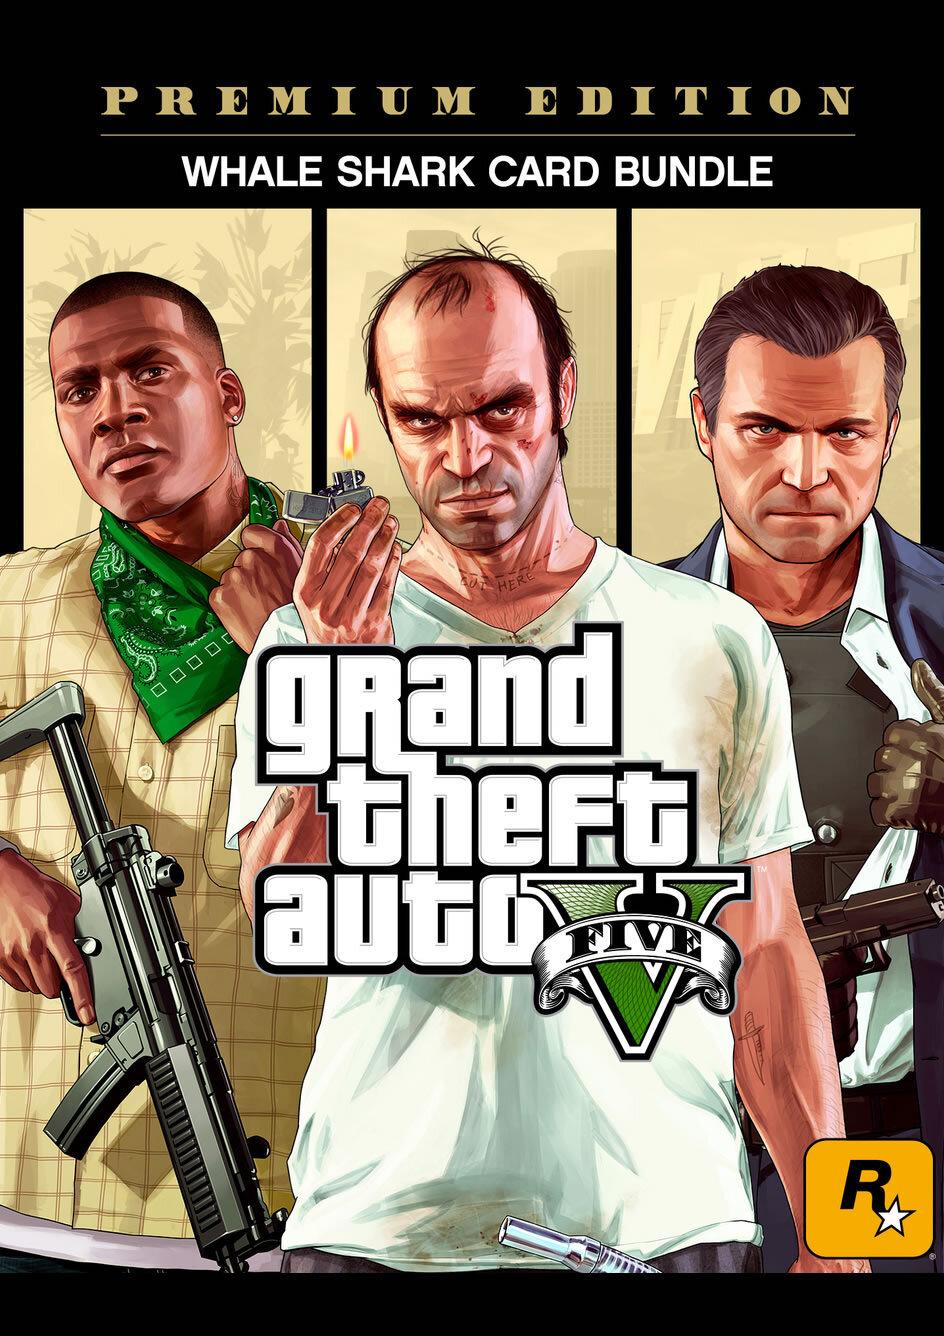 Grand Theft Auto V: Premium Online Edition & Whale Shark Card Bundle - Social club